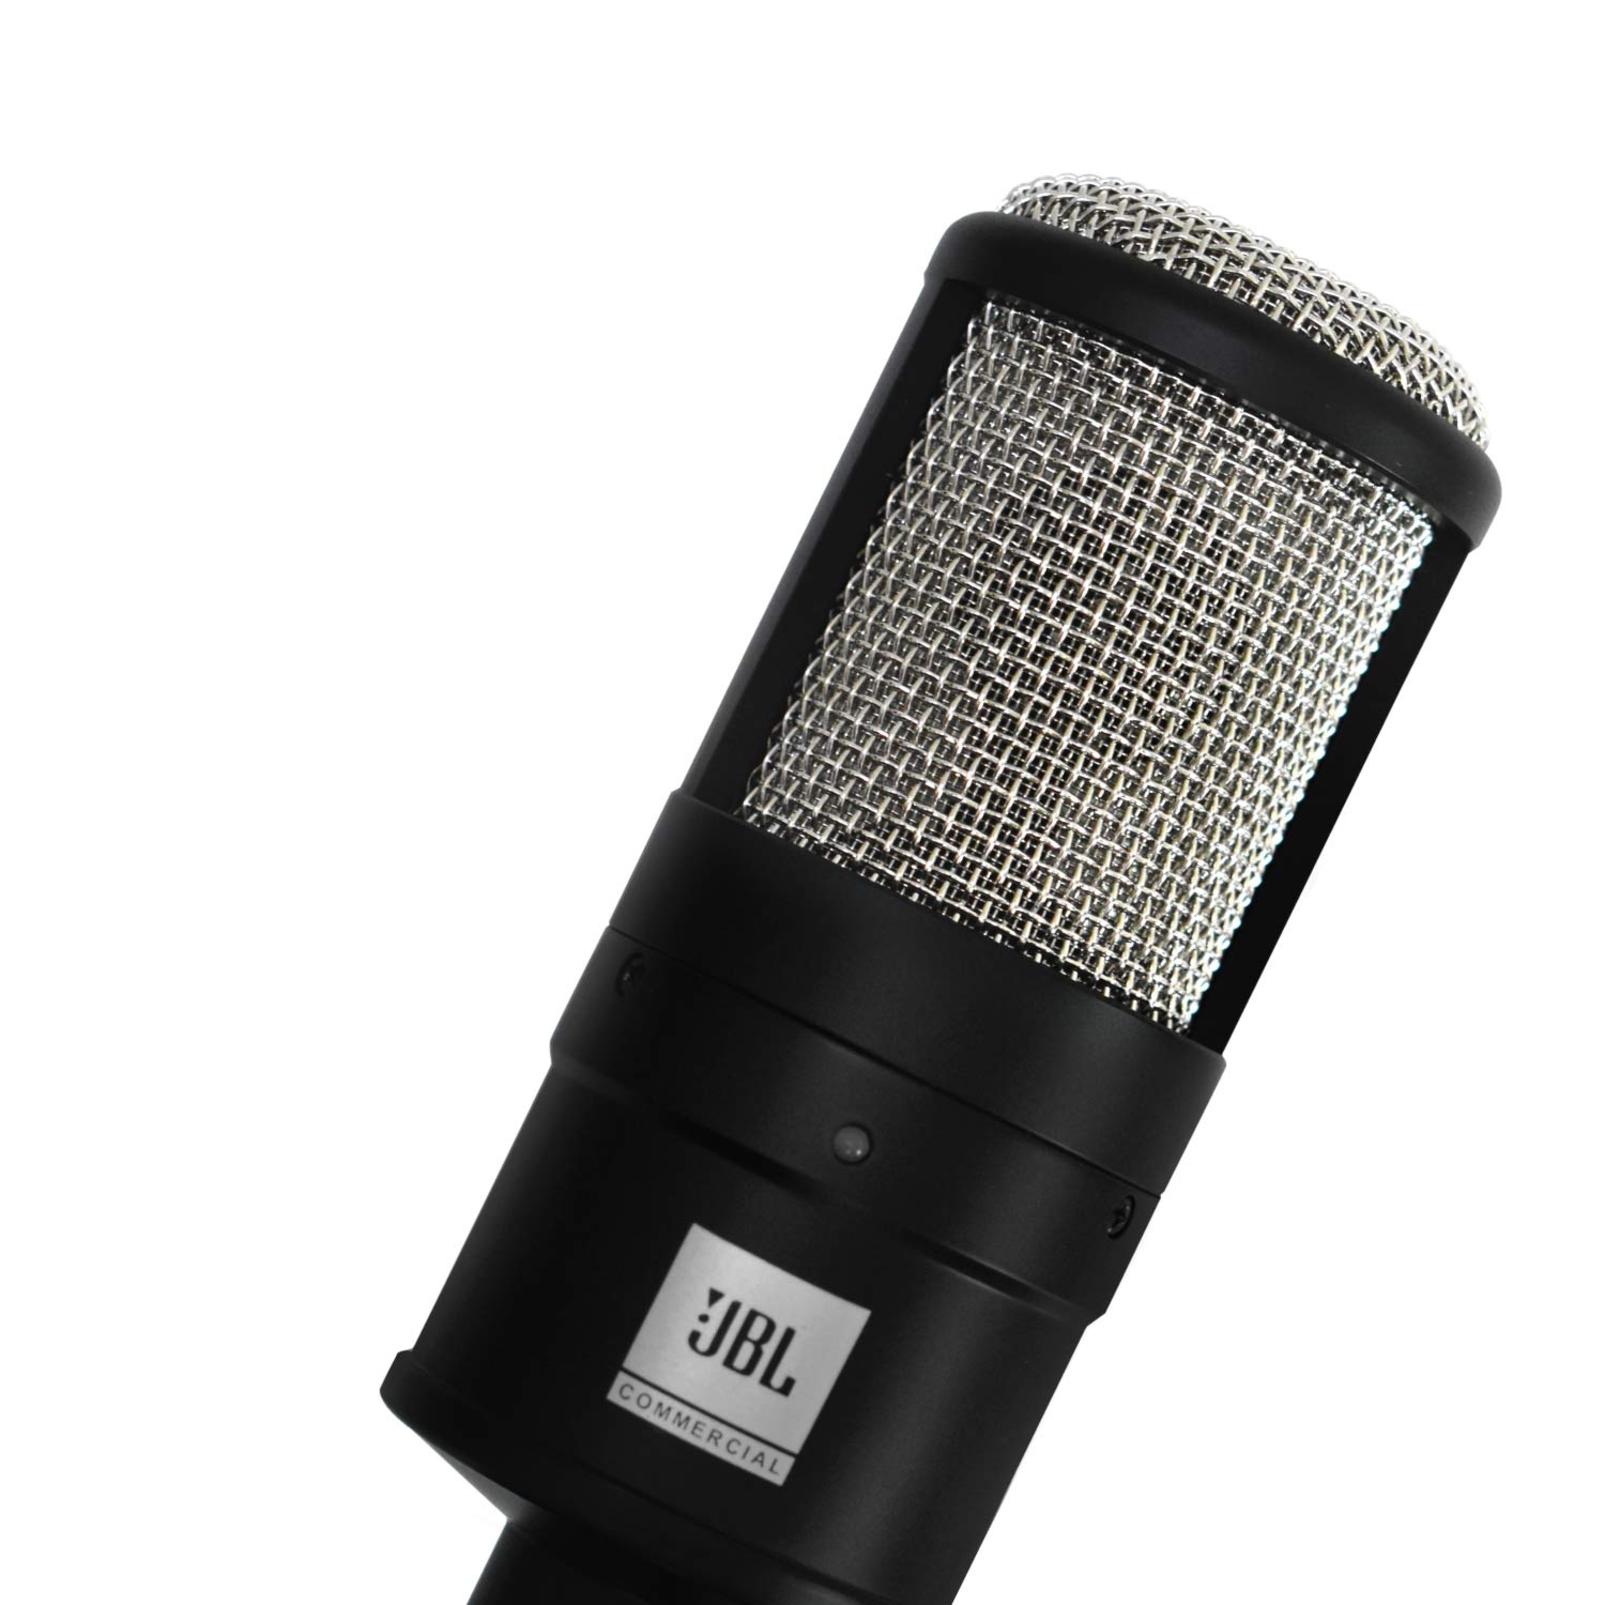 CSSM100 - Black - Studio Condenser Microphone - Detailshot 1